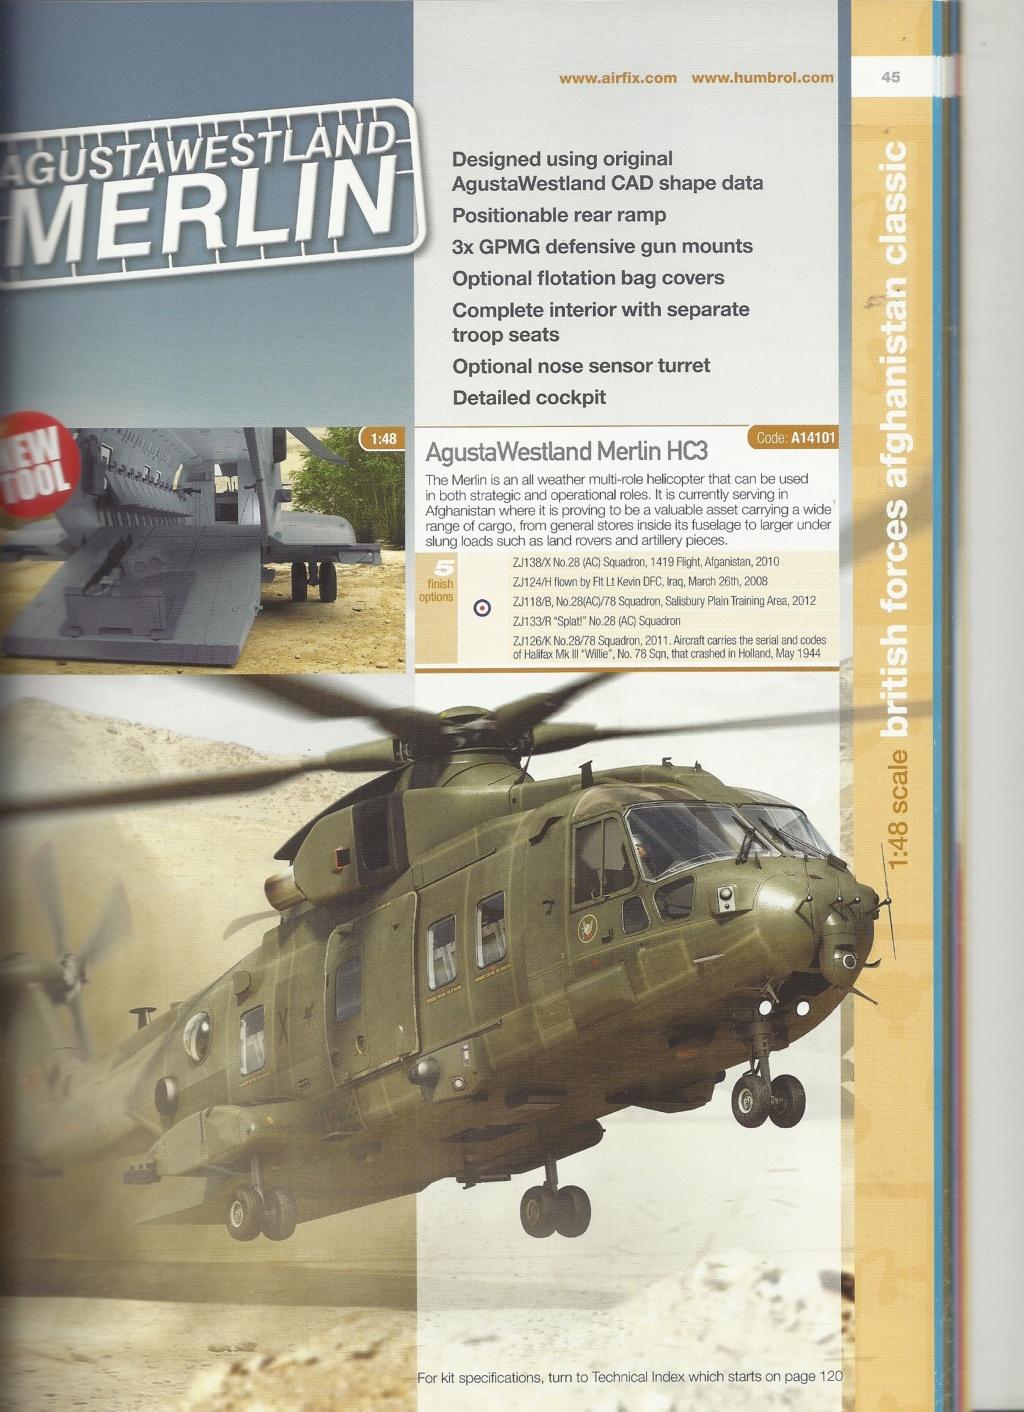 [AIRFIX 2013] Catalogue 2013 Airf1498